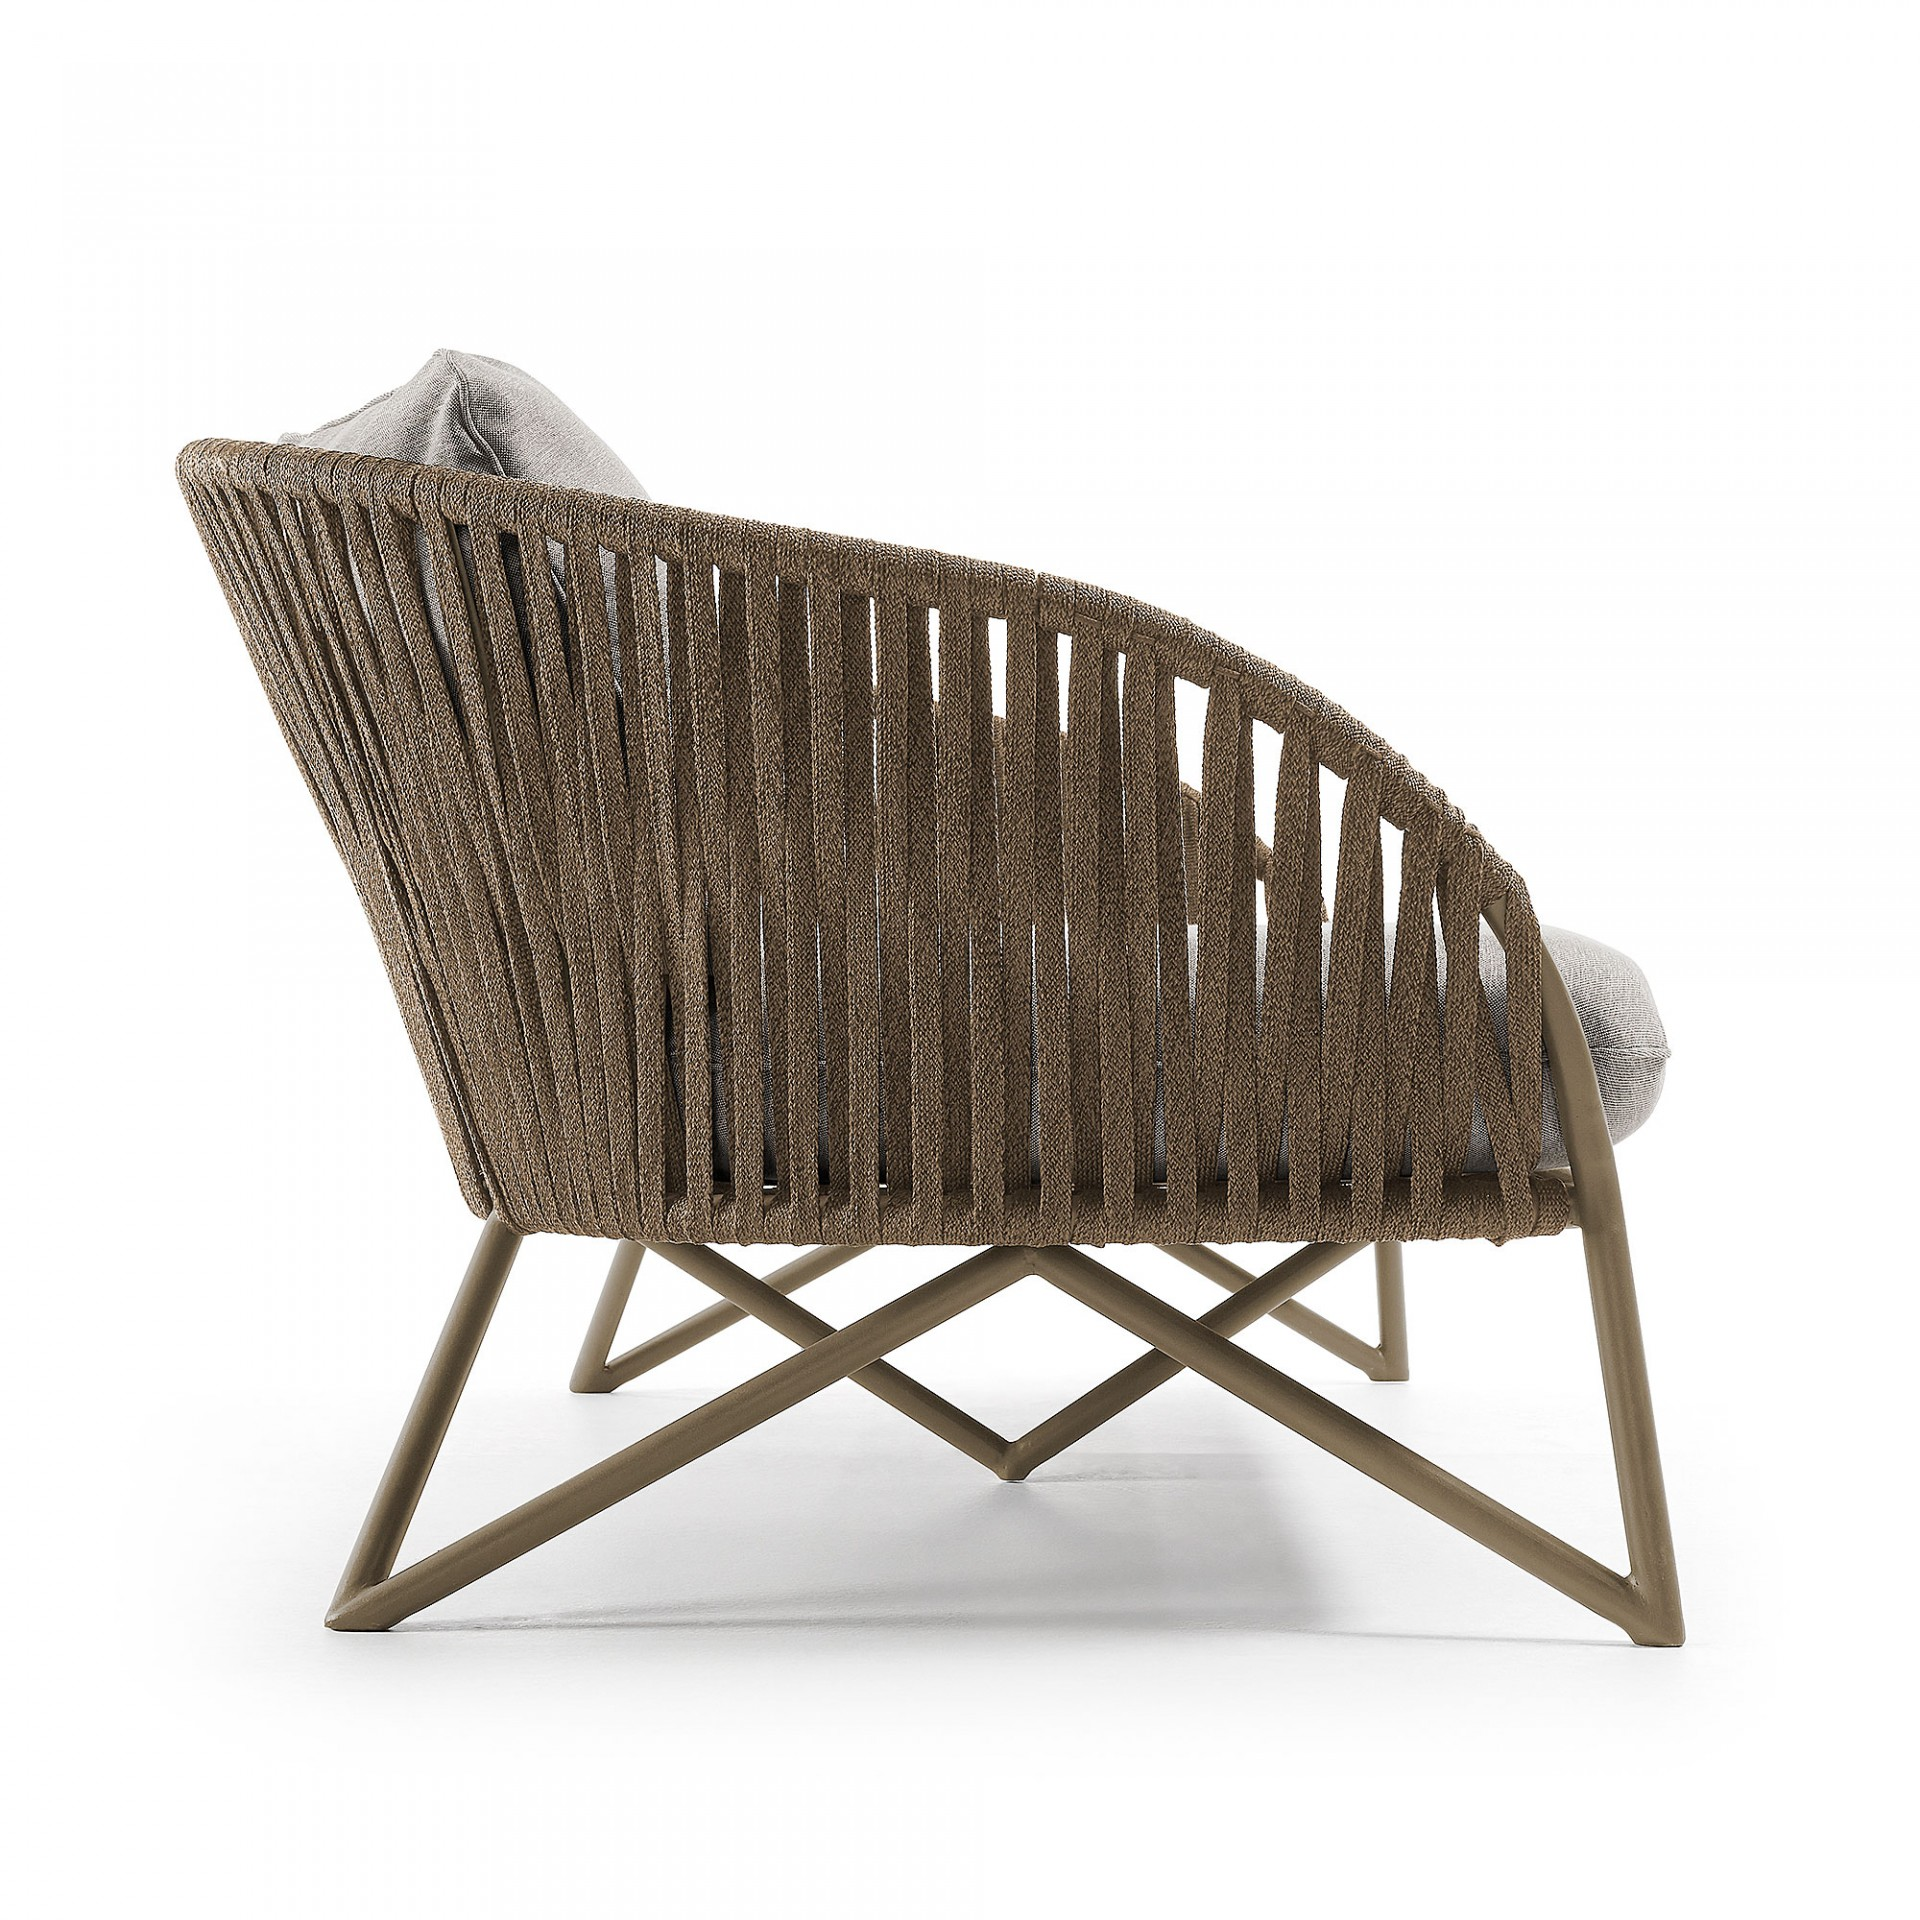 Sofá de jardim Brazi, 3x lugares, c/almofadas, corda de poliéster/metal